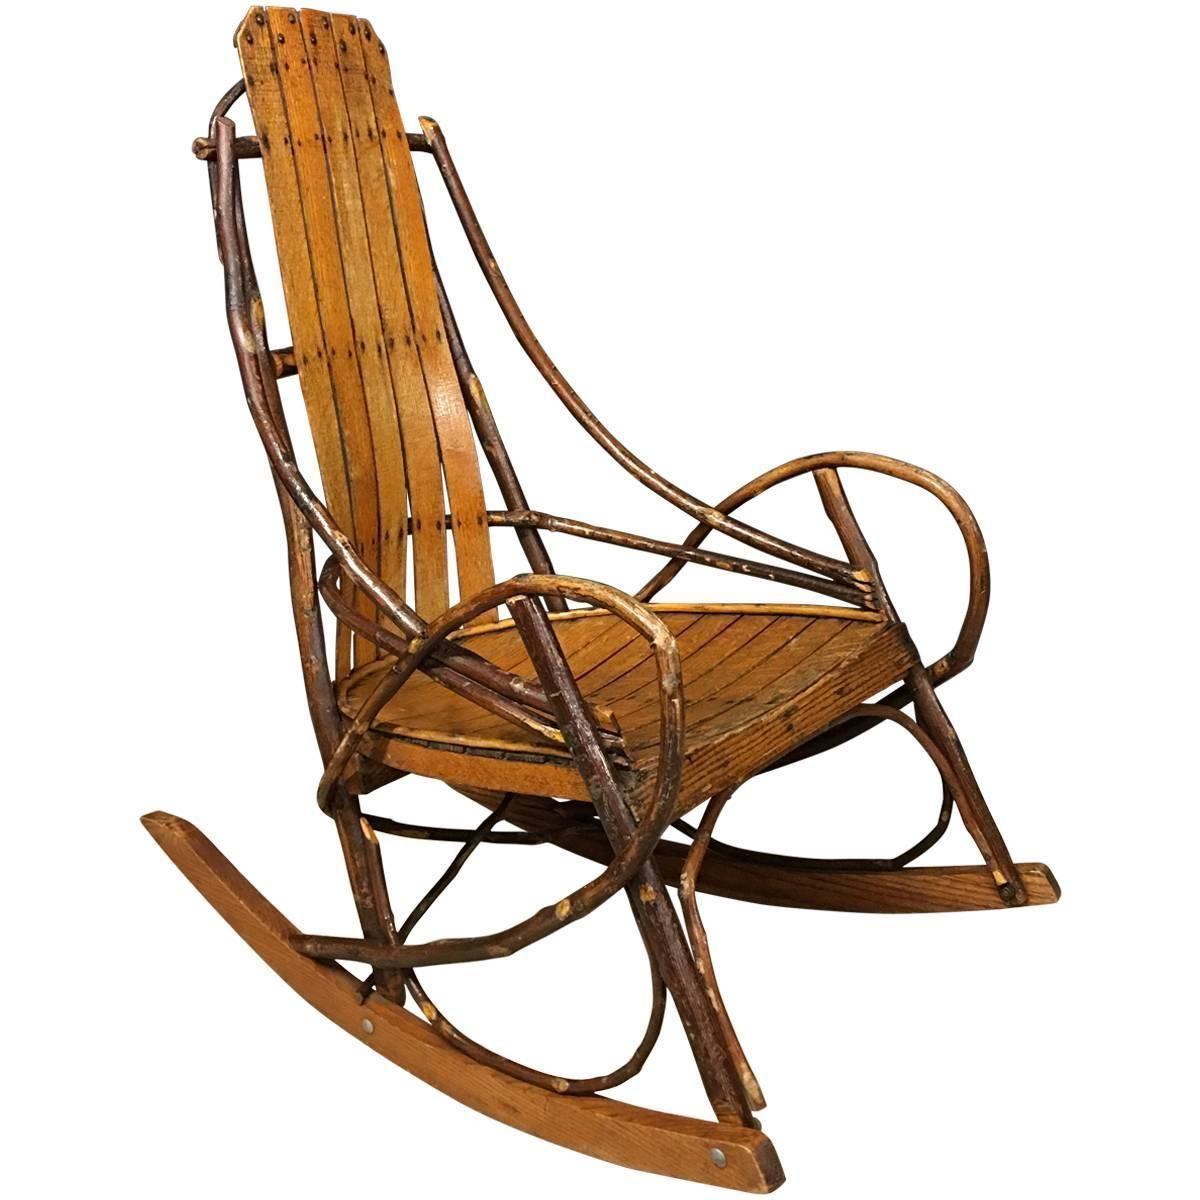 1920s Rocking Chair Ergonomic Stokke Varier Thatsit Vintage American Adirondack My 1stdibs